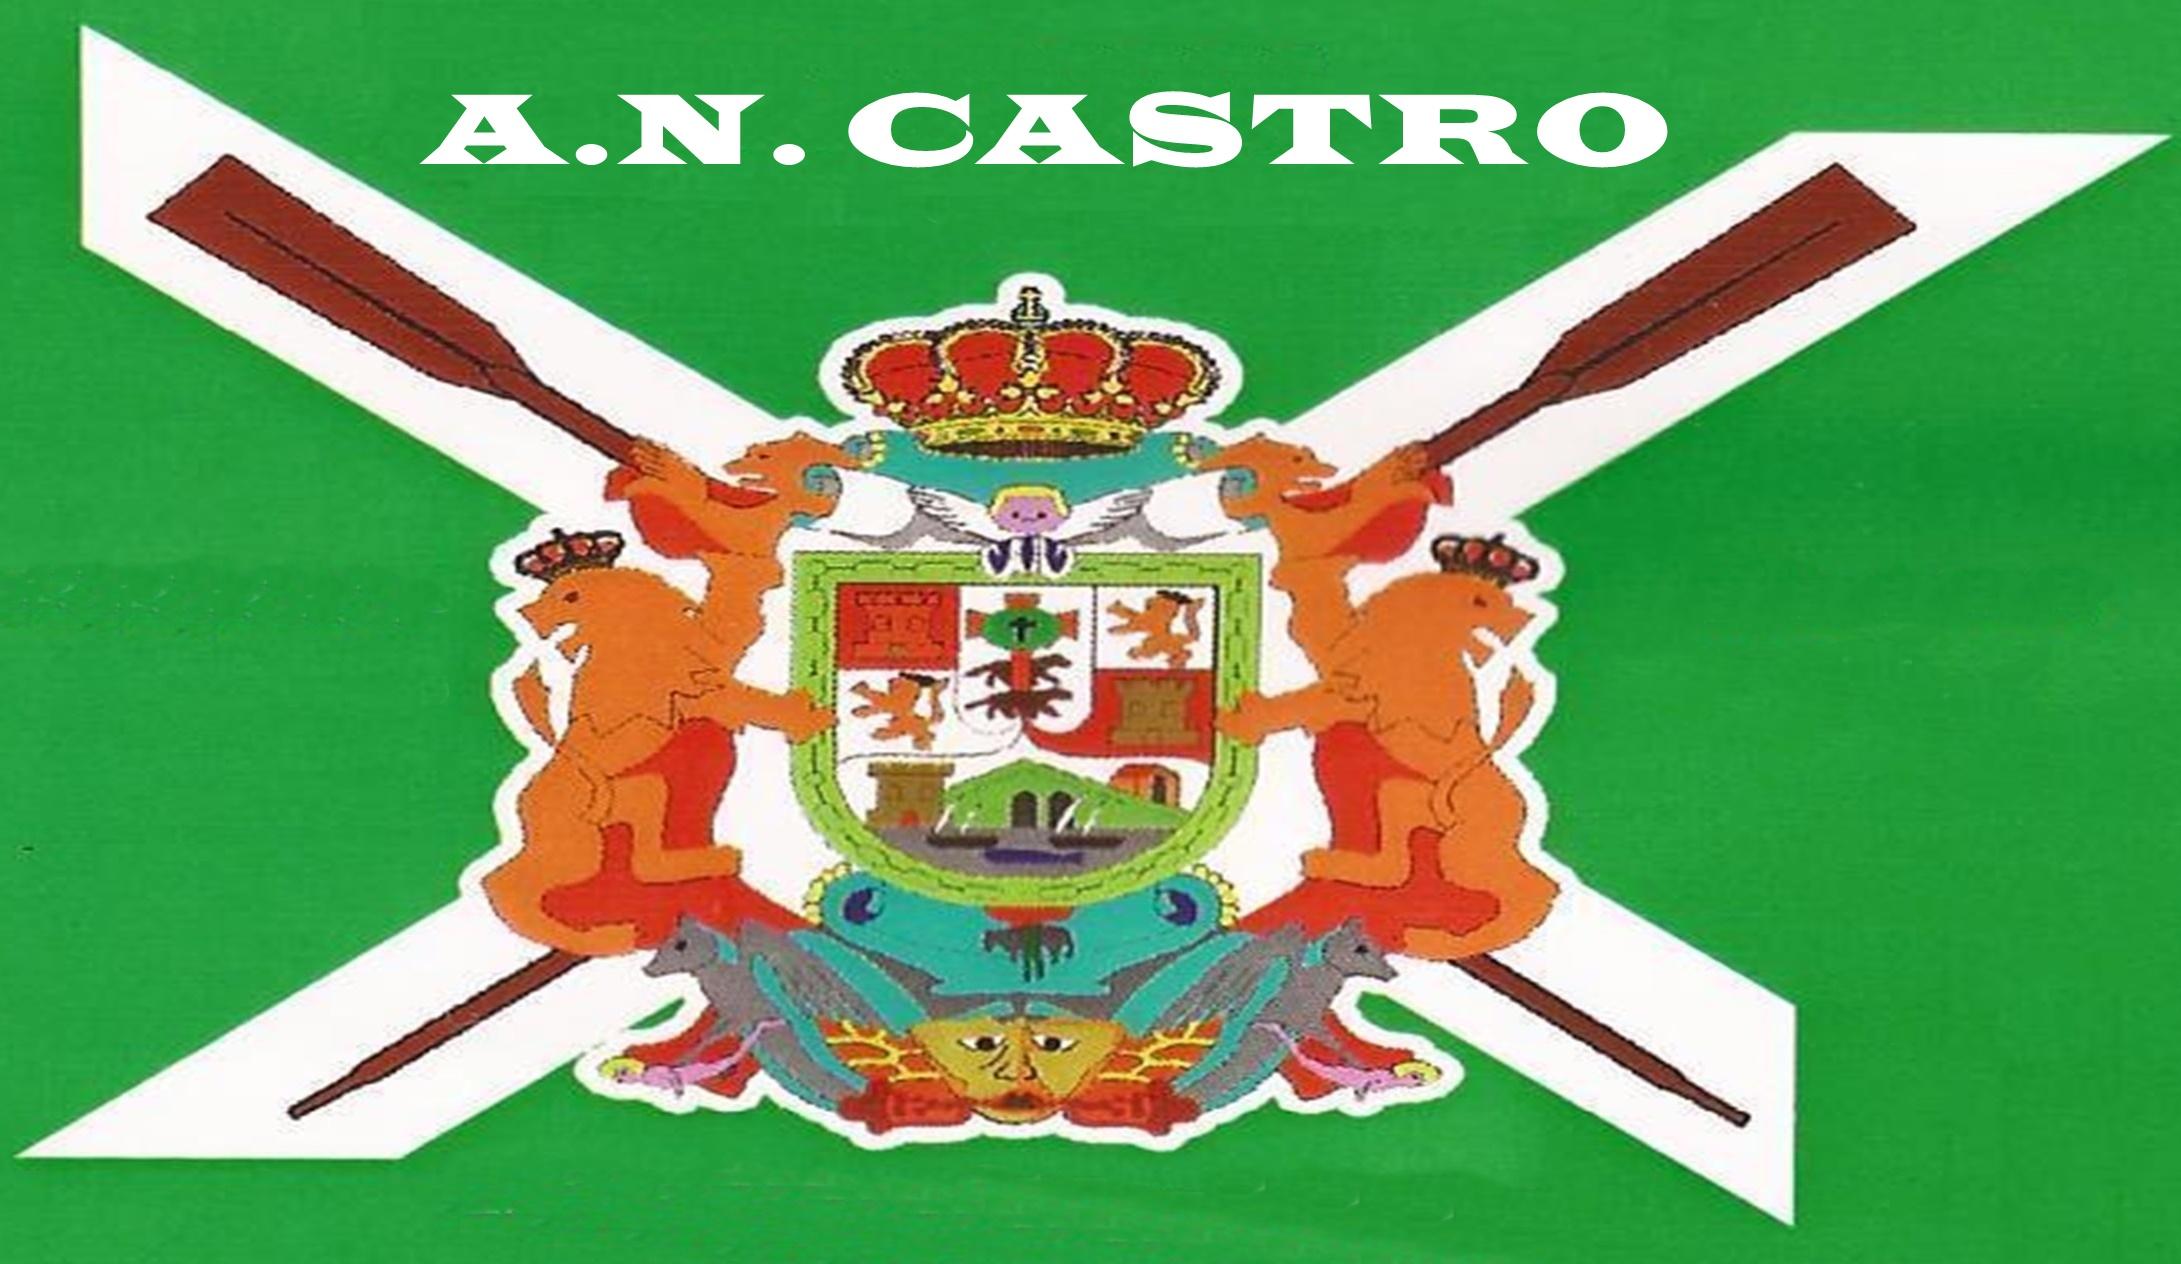 http://federemo.org/wp-content/uploads/2014/03/escudo-club-A.N.CASTRO-1.jpg